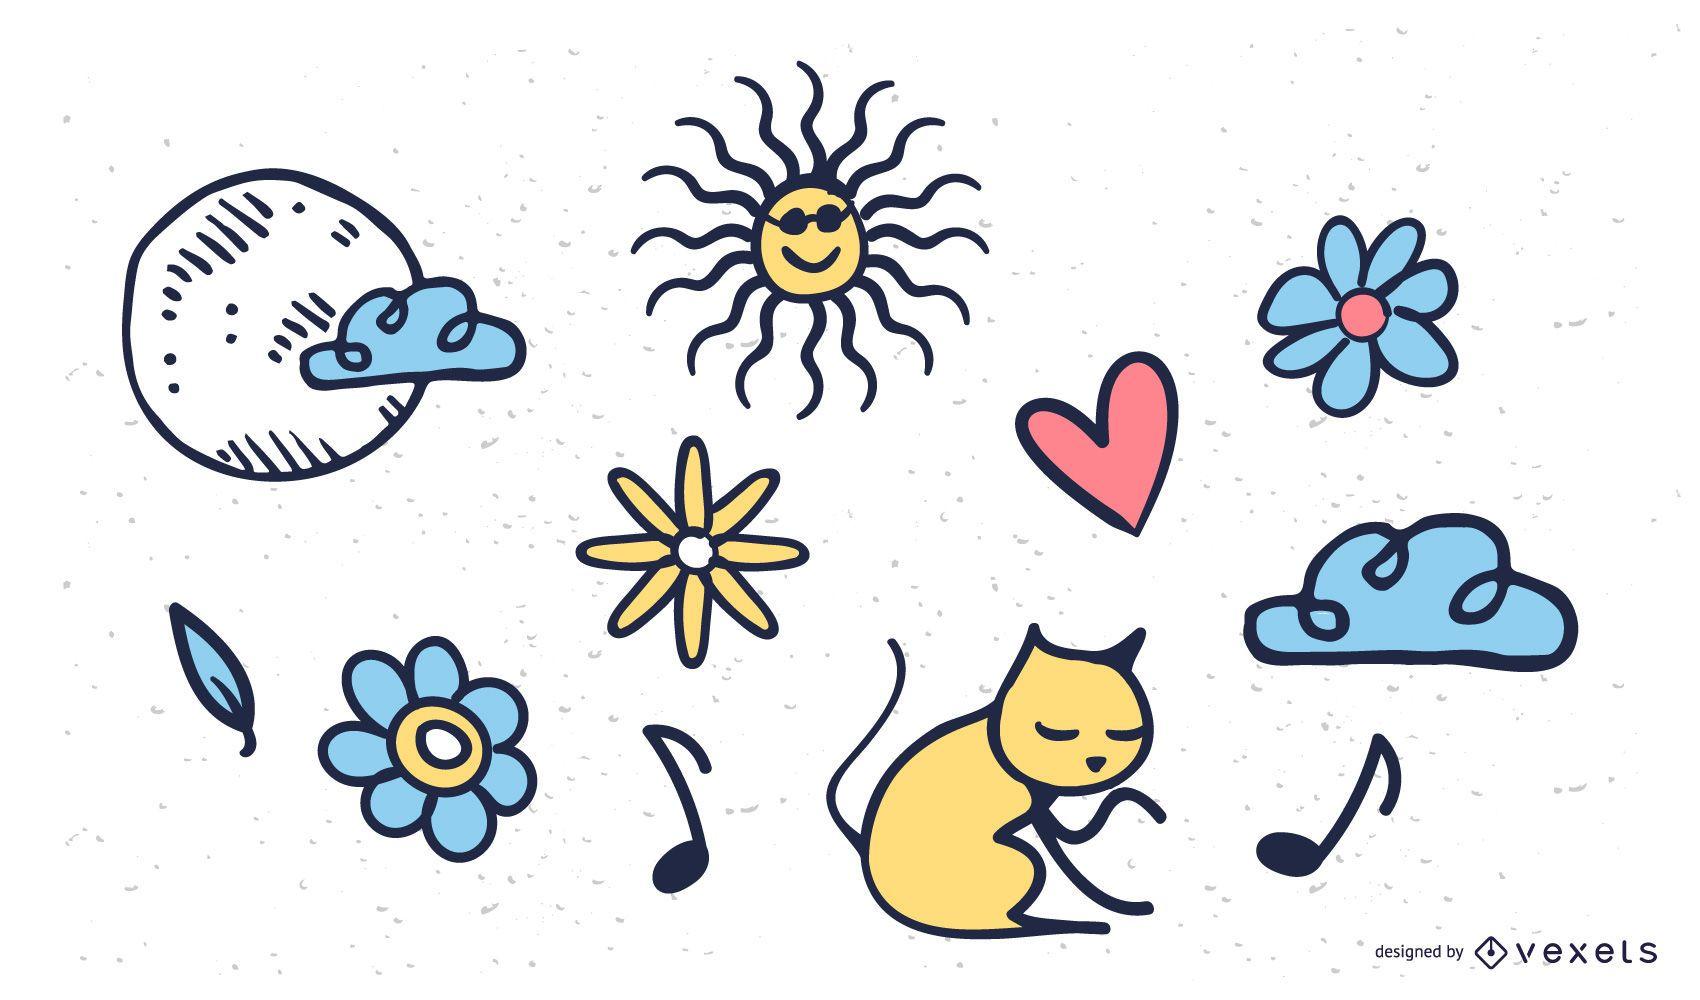 Cute doodles illustration set